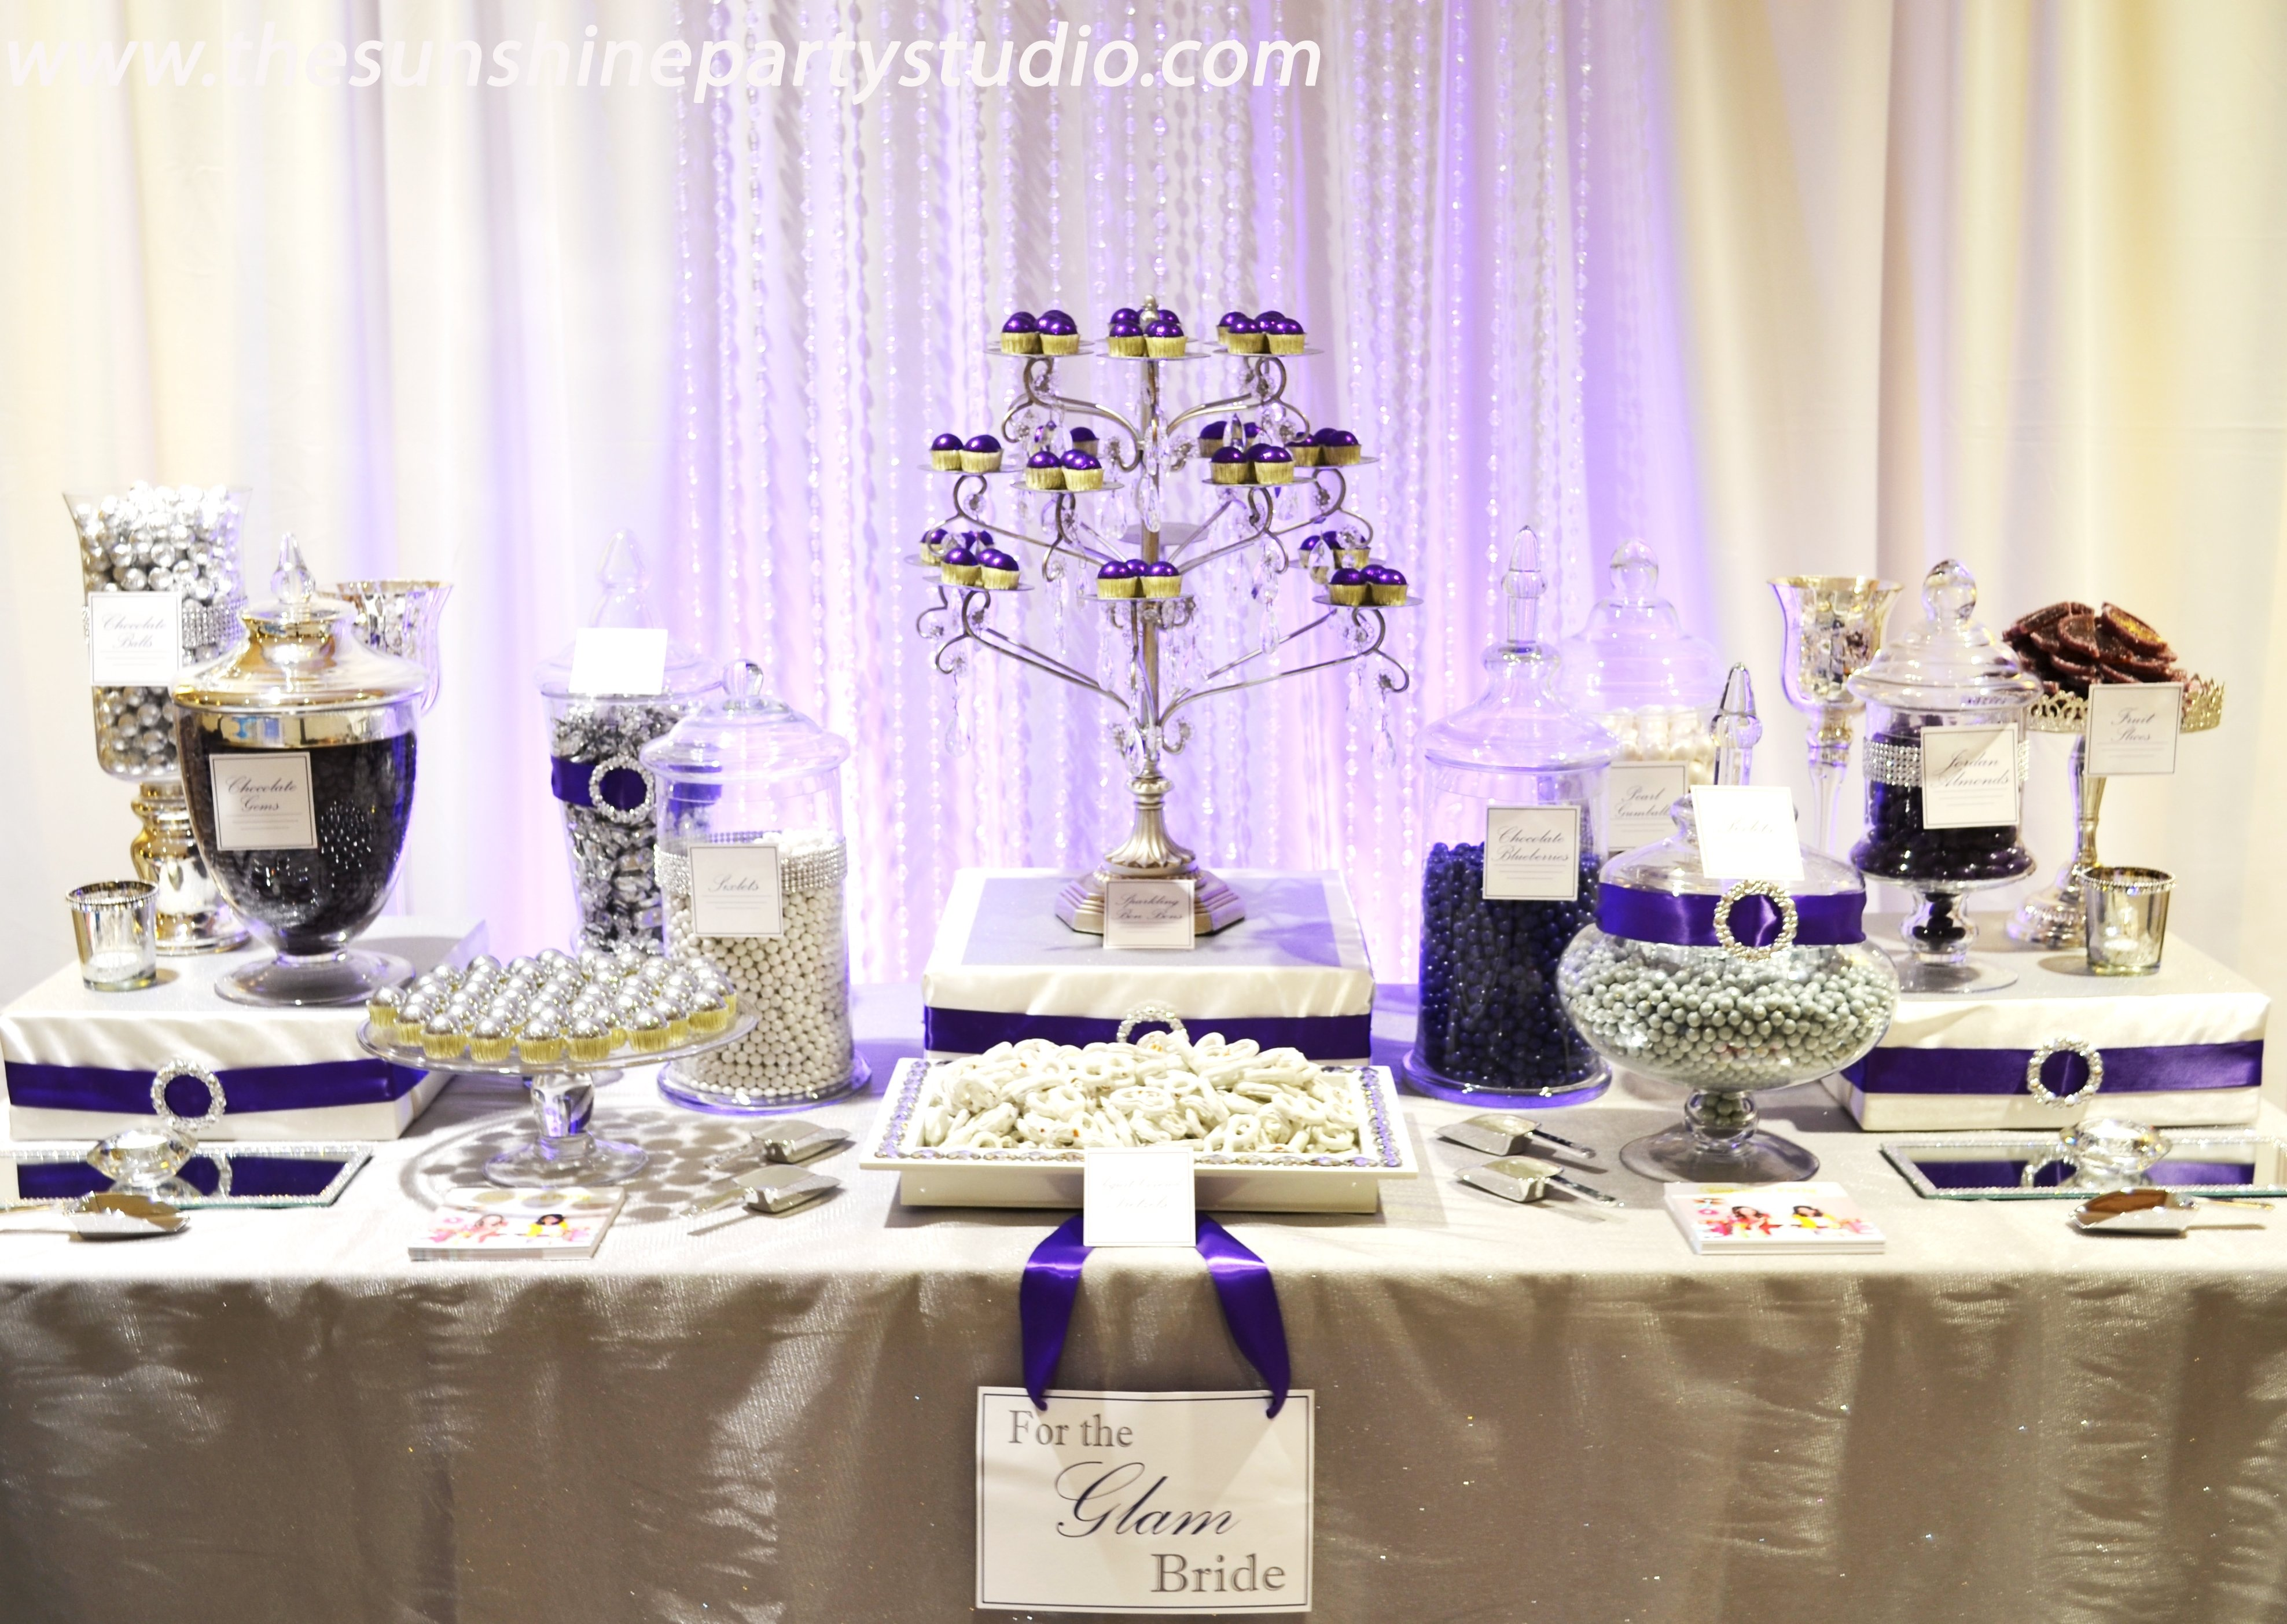 10 Amazing Candy Bar Ideas For Weddings wedding candy table ideas wedding photography 2020